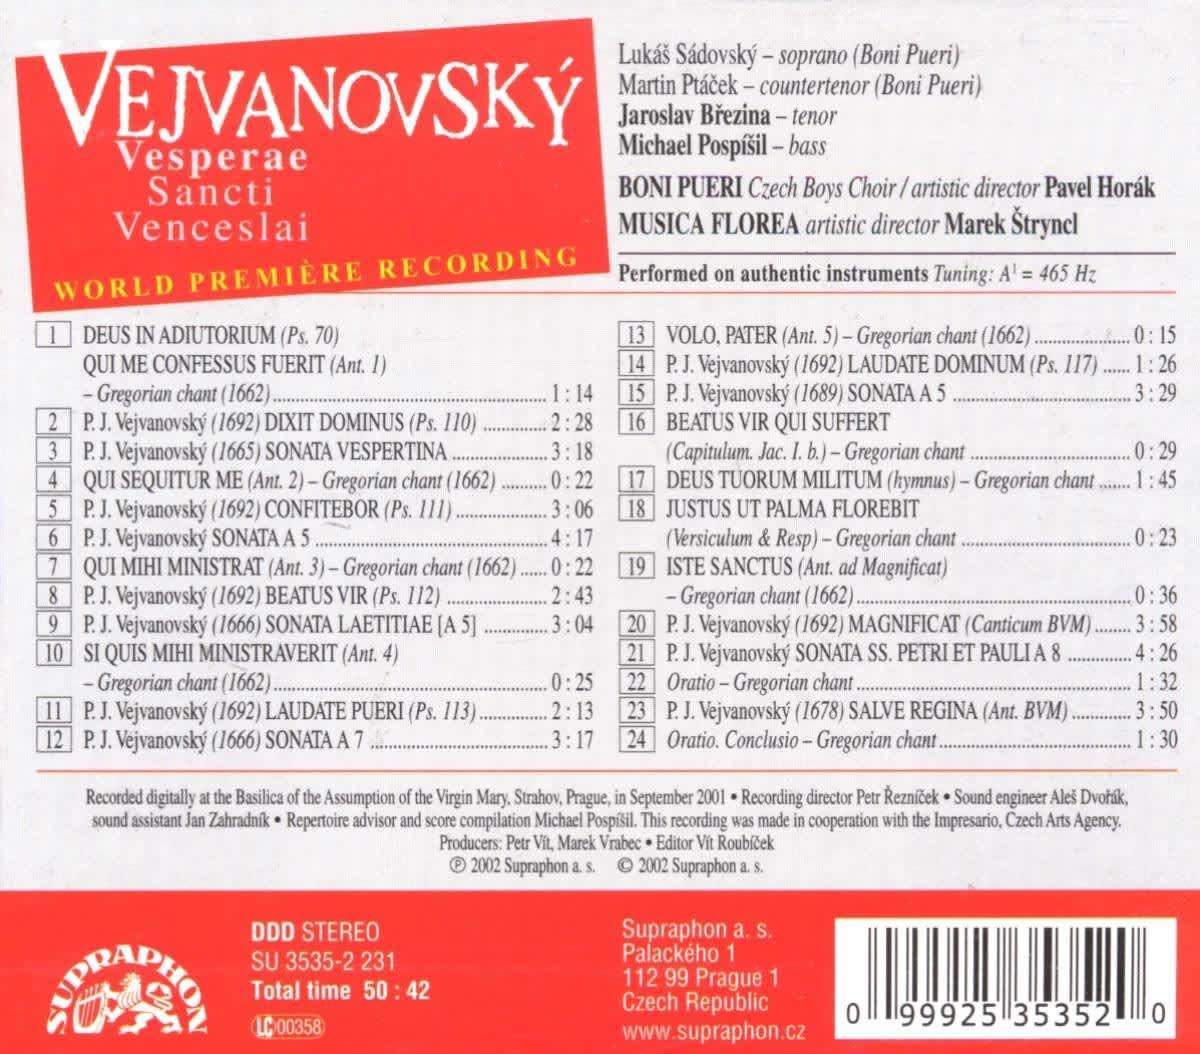 Photo No.2 of Pavel Josef Vejvanovsky: Vesperae Sancti Venceslai